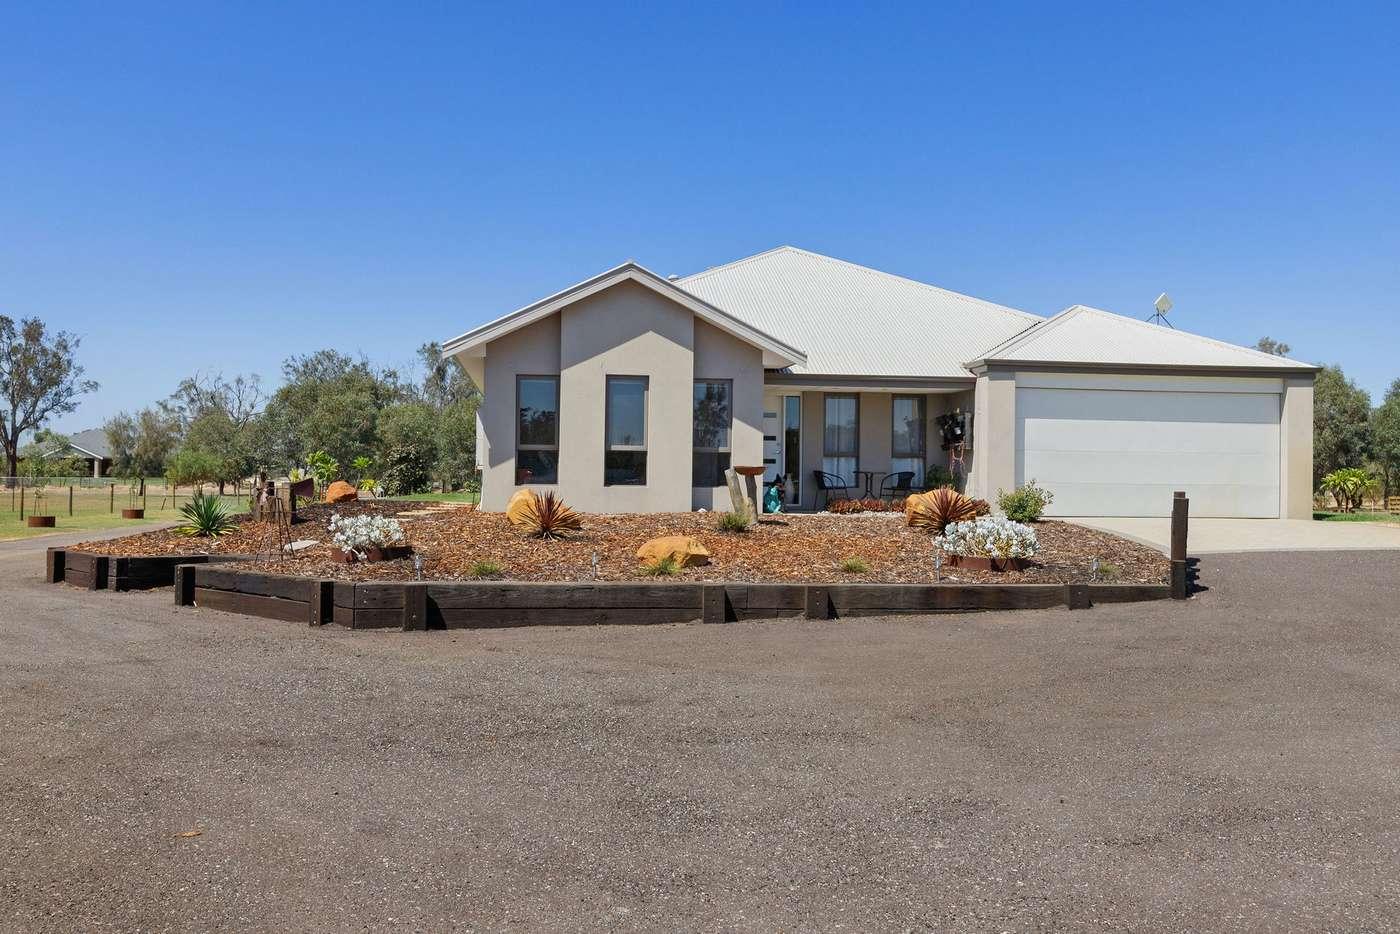 Main view of Homely house listing, 12 Elwood Loop, Oakford WA 6121